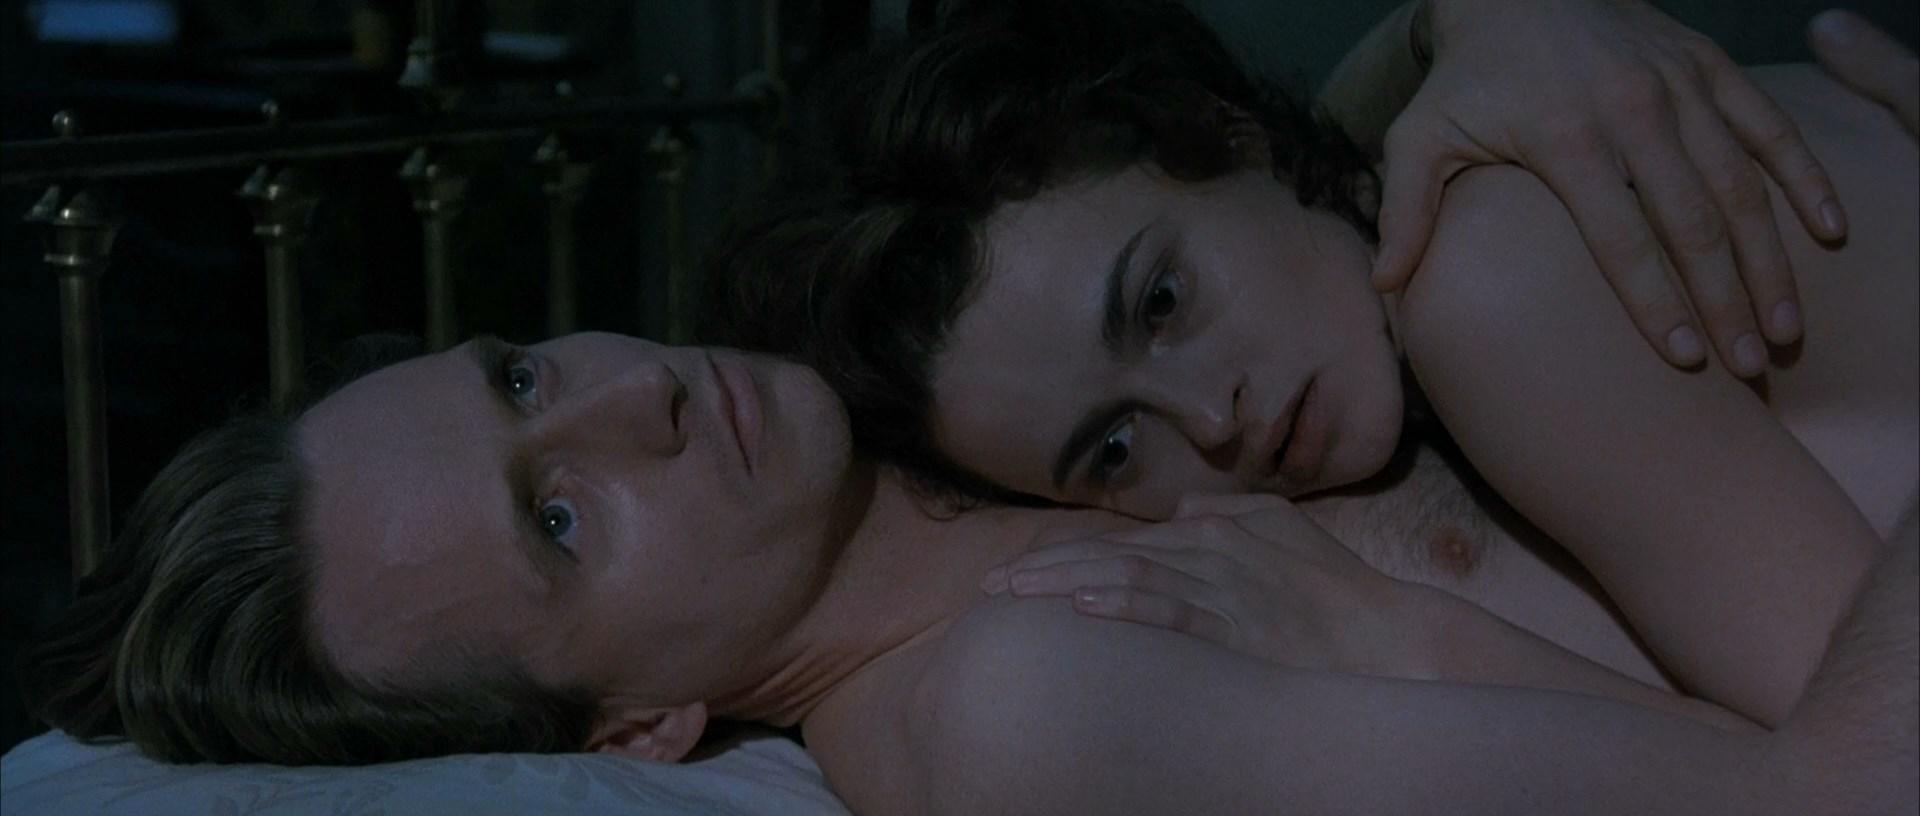 Sarah bonham carter naked, ex girlfriend sucks dick